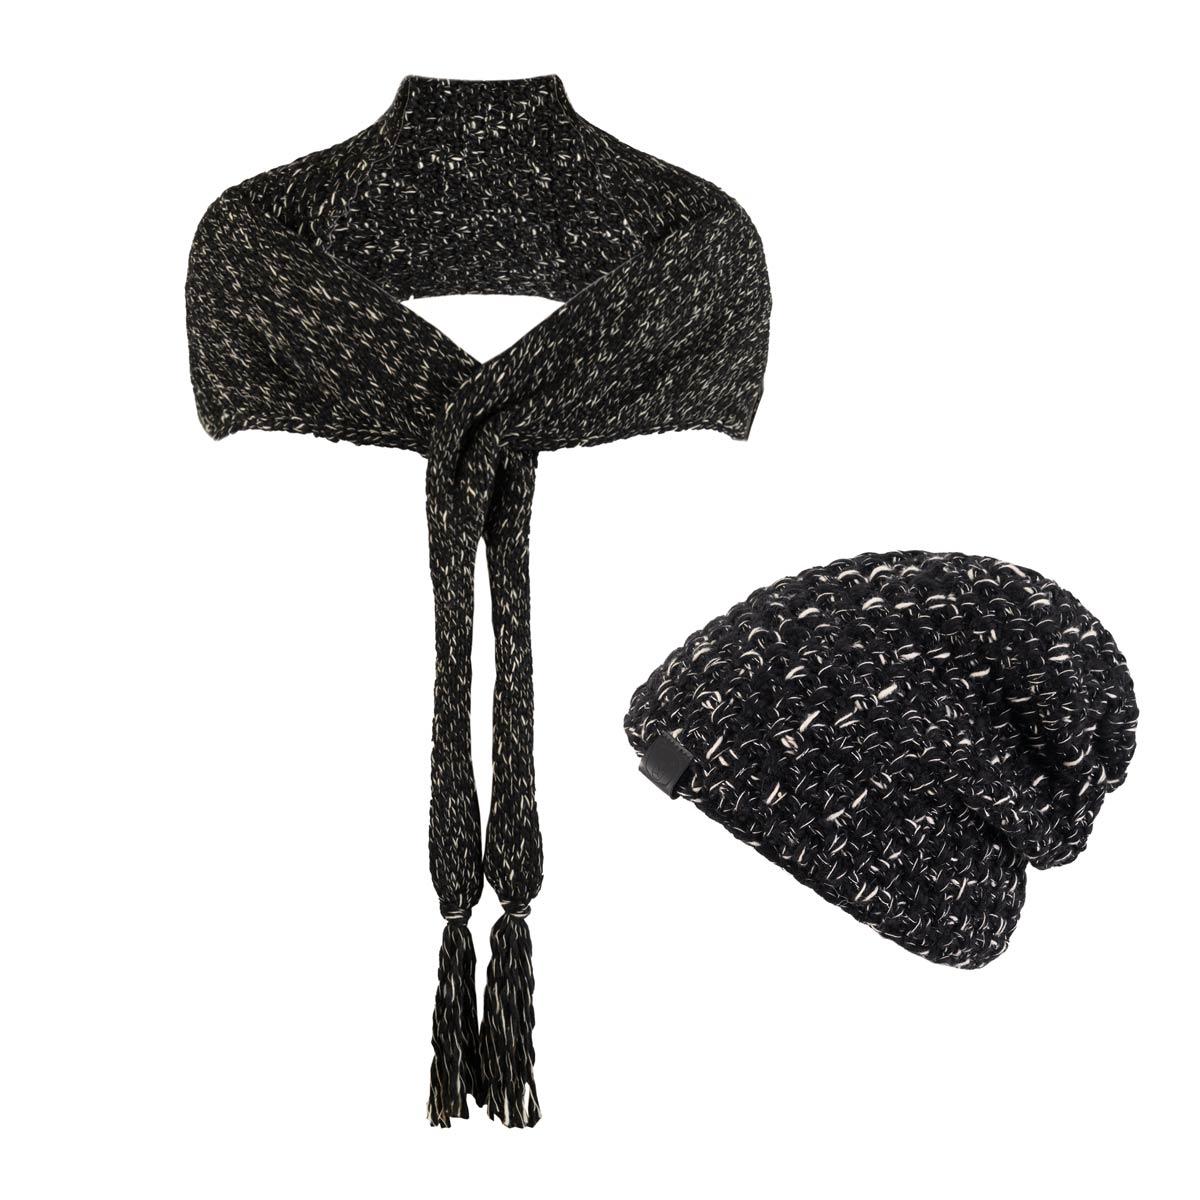 PK-00132_F12-1--_Ensemble-chaud-bonnet-echarpe-noirs